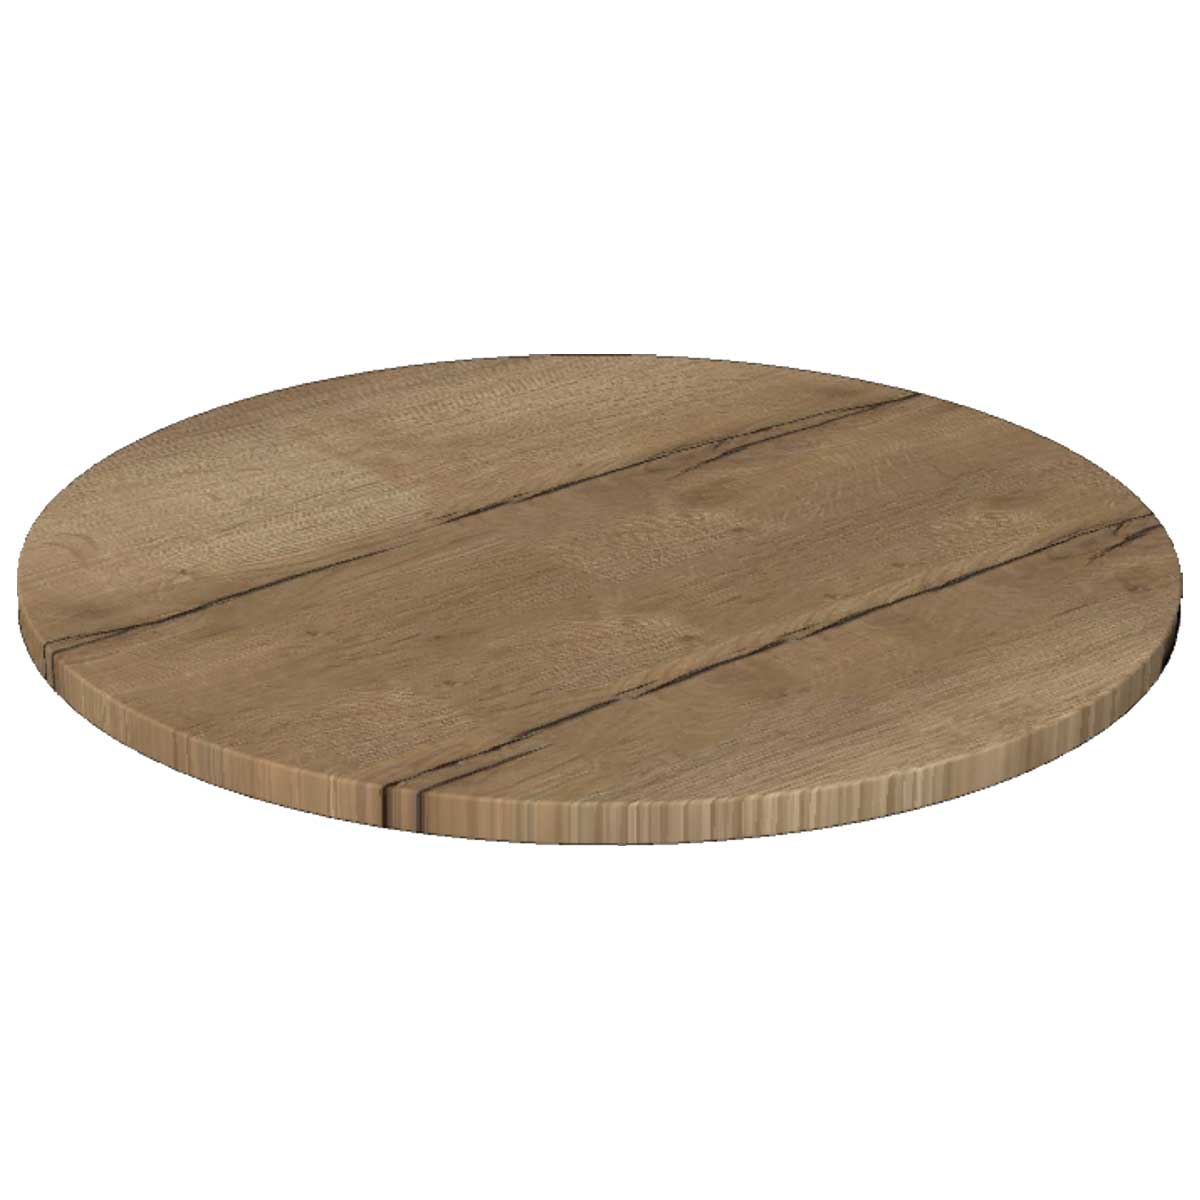 TICAM R60 1180 - https://www.werzalit.com/en/product/table-top-cambium-r-oe60cm-board-thickness-39cm-decor-halifax-naturel/